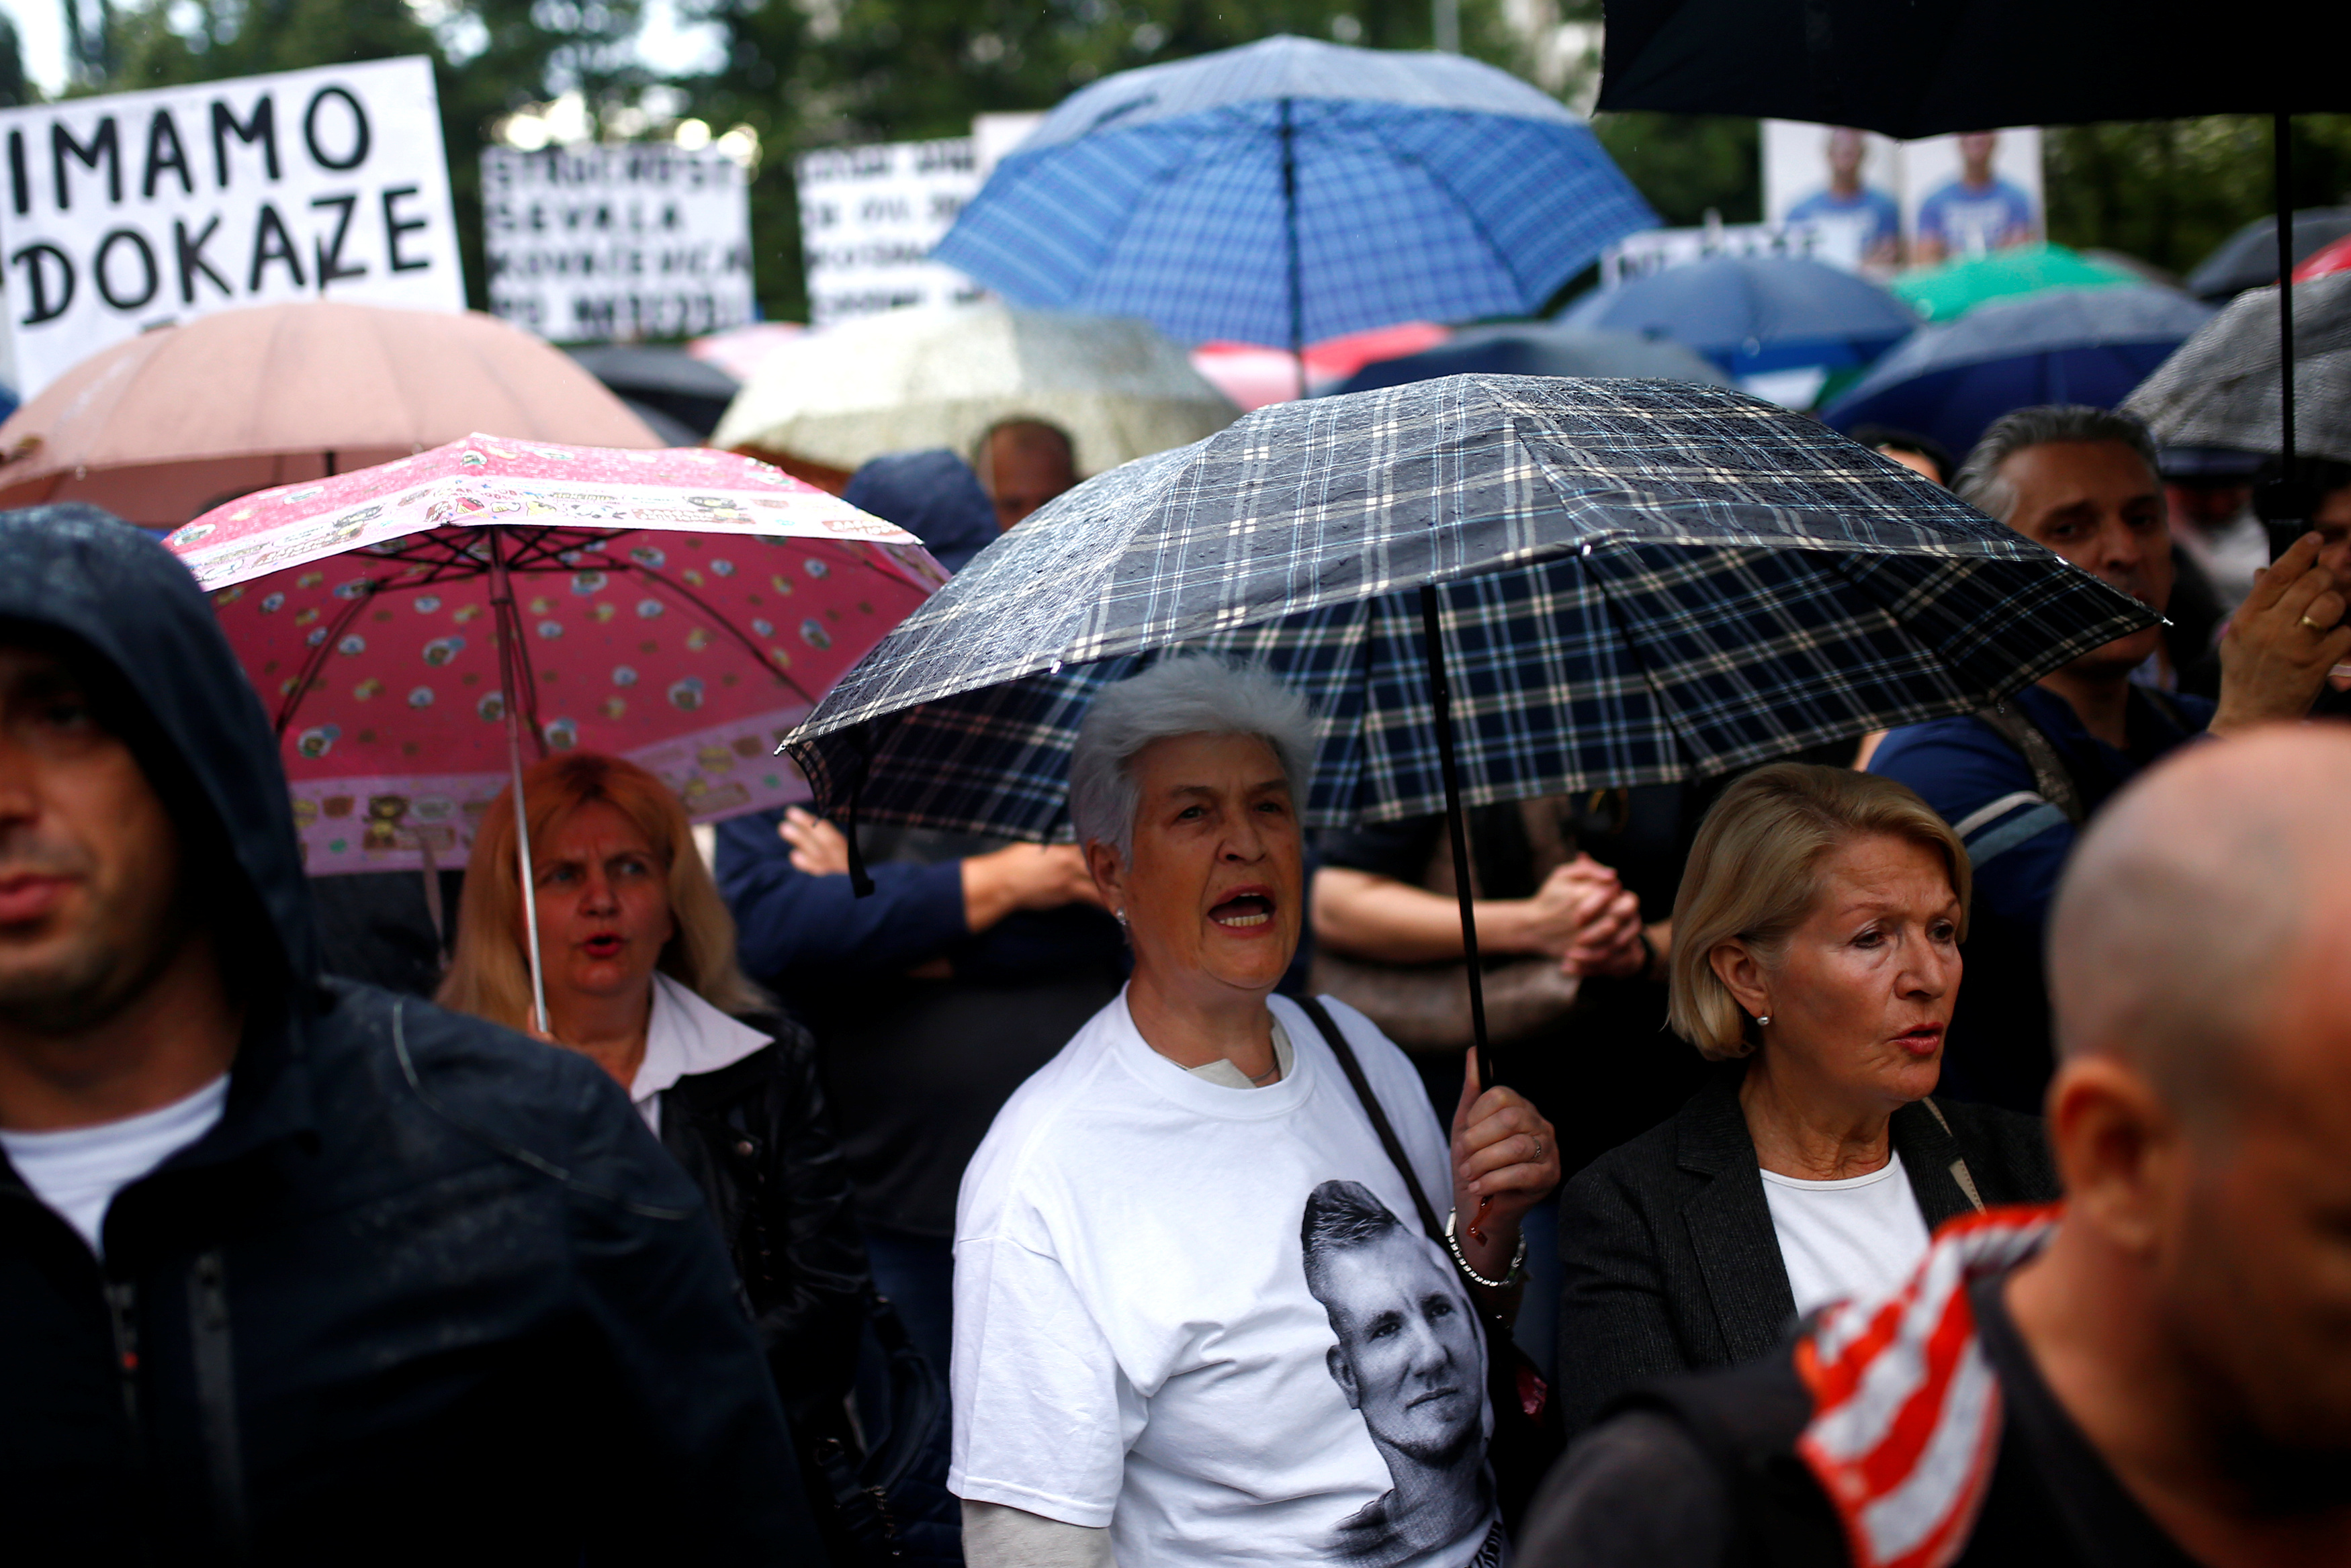 2018-05-15T211645Z_568544840_RC1E045D5200_RTRMADP_3_BOSNIA-PROTESTS.JPG